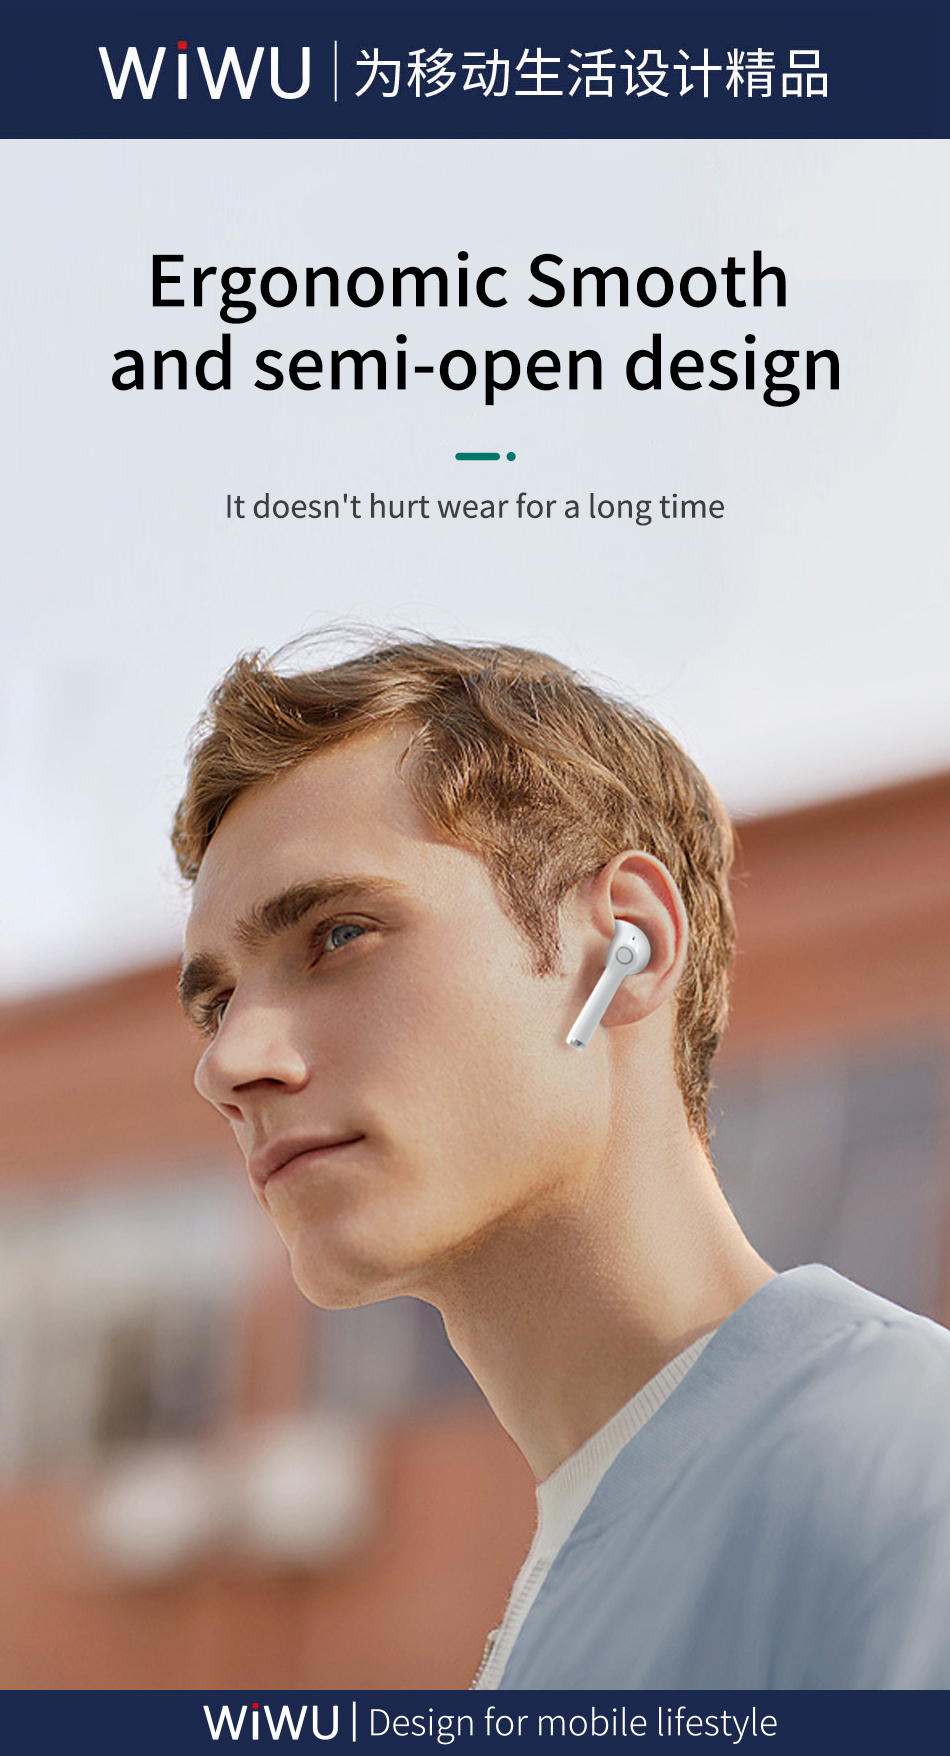 WiWU TWS06真无线双耳 蓝牙耳机 (https://www.wiwu.net.cn/) 耳机 第6张